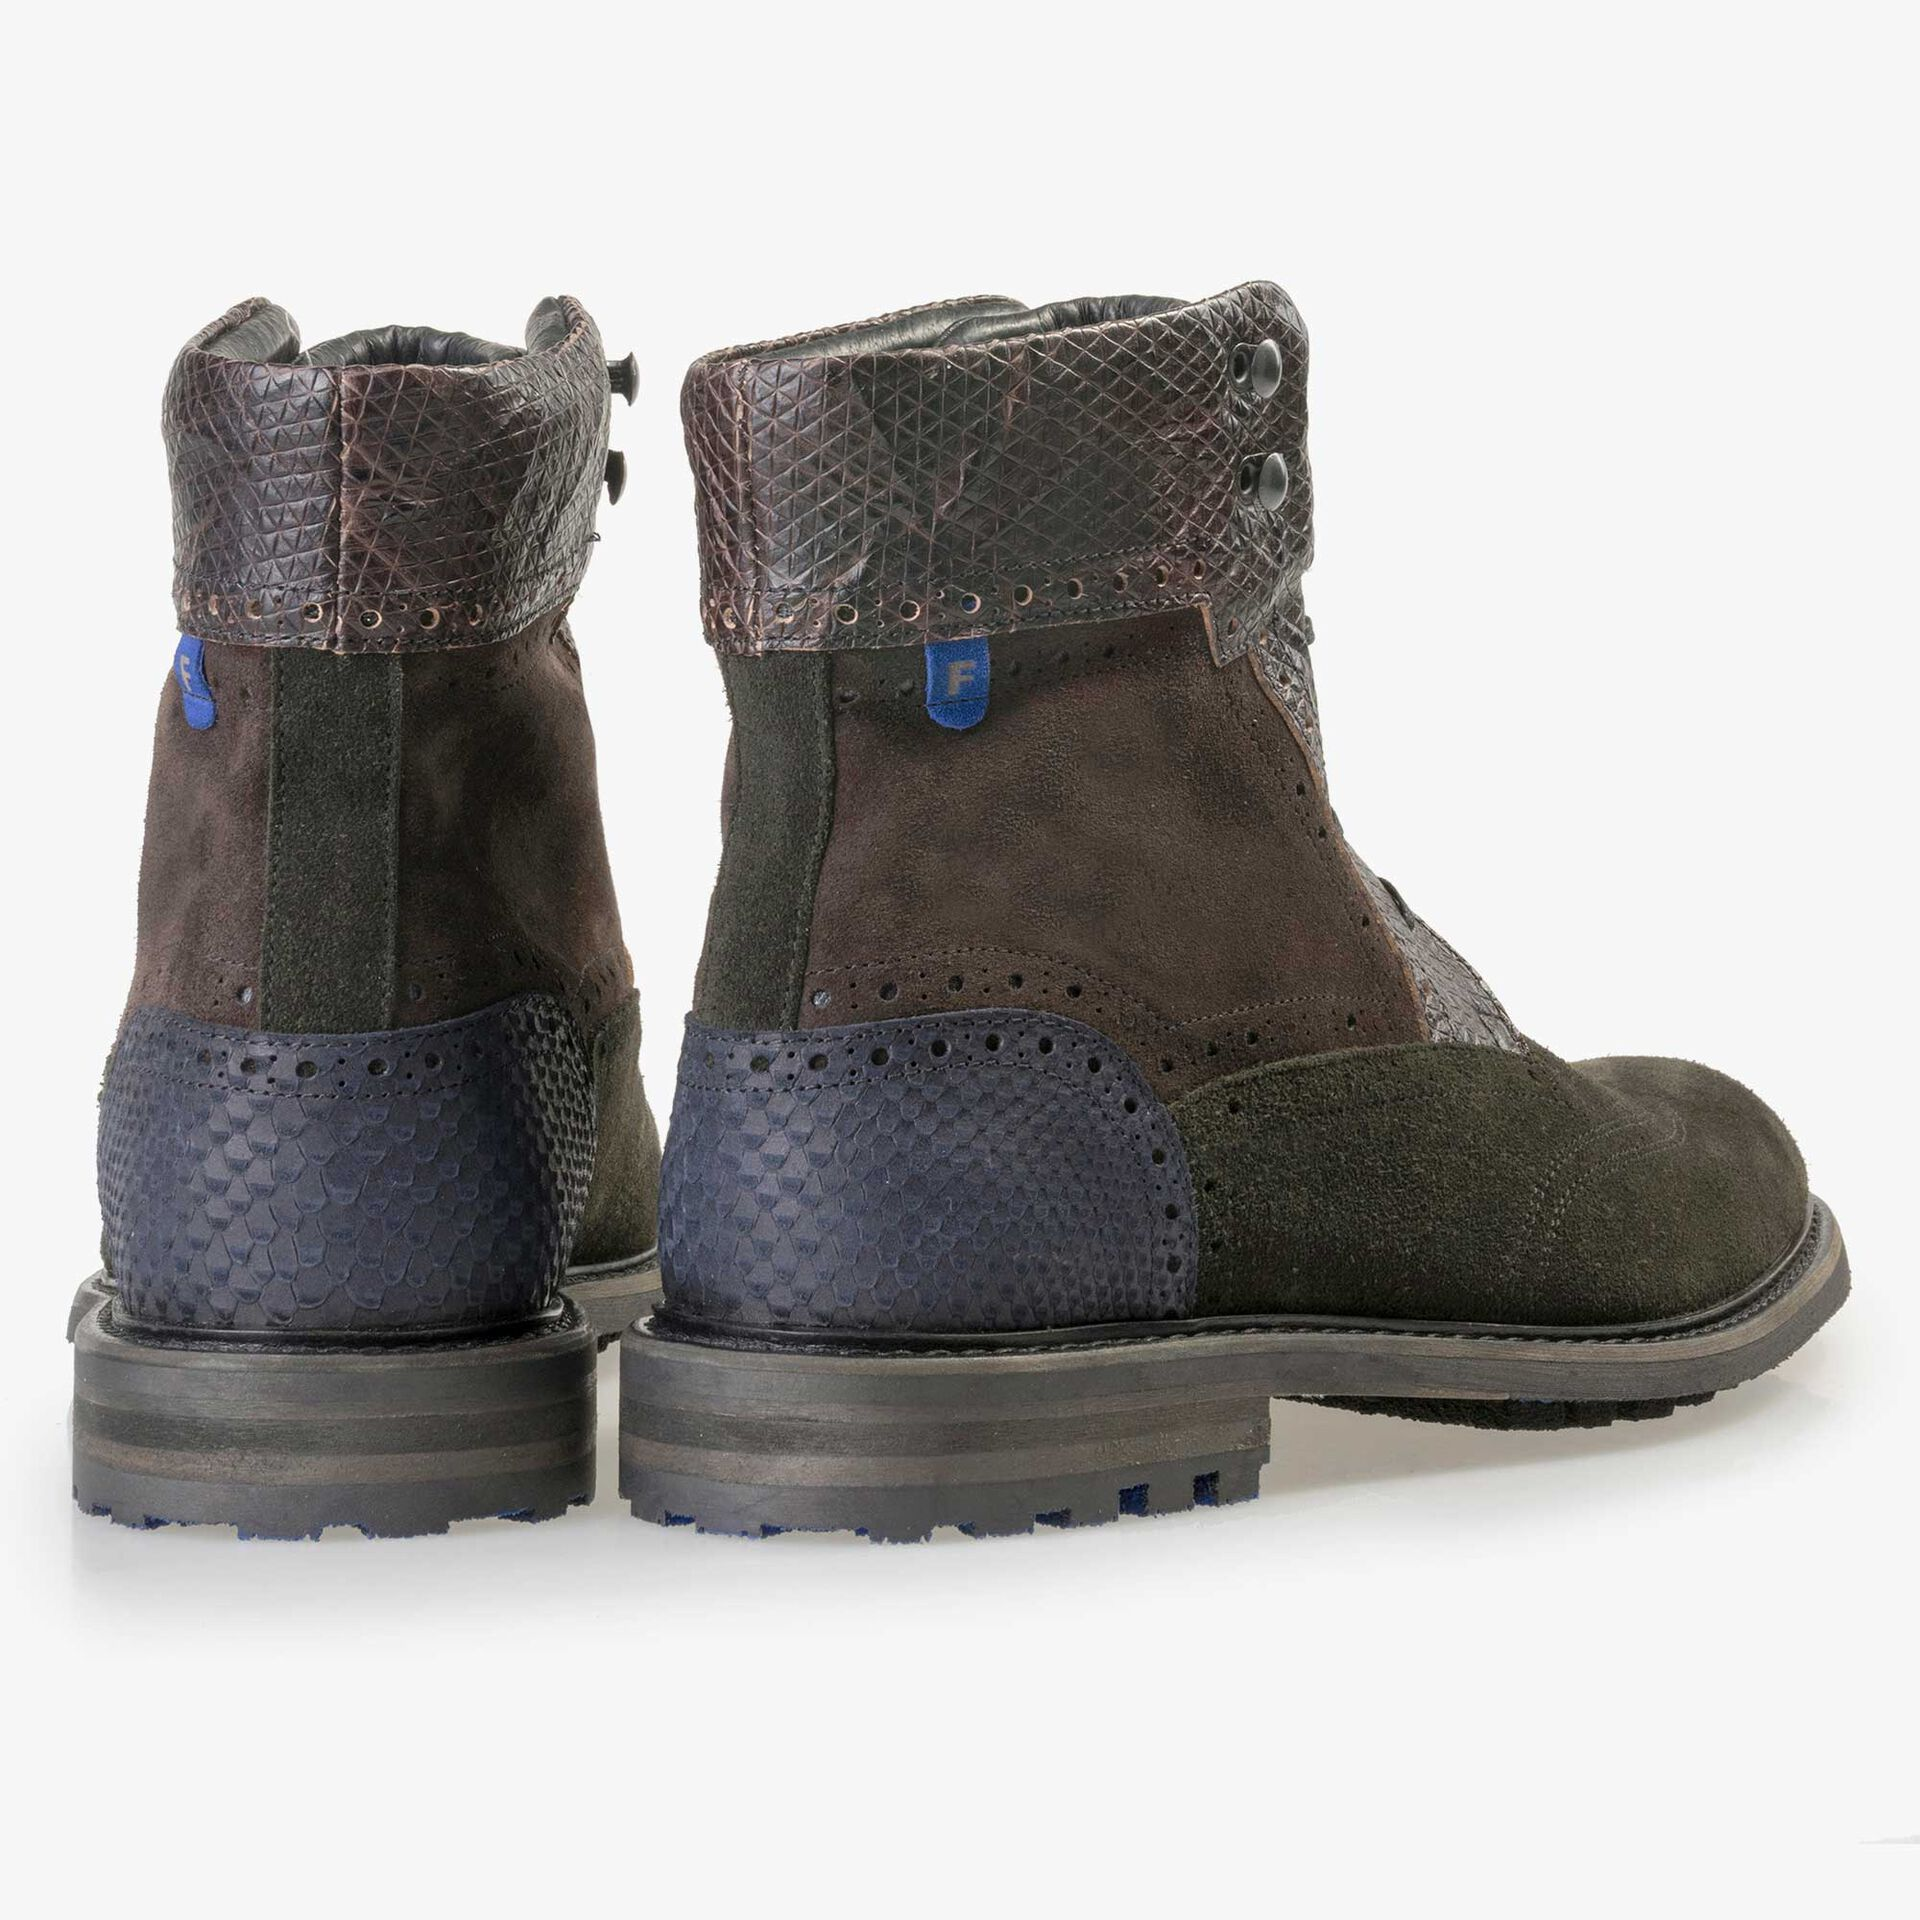 Floris van Bommel dark green high suede leather lace boot